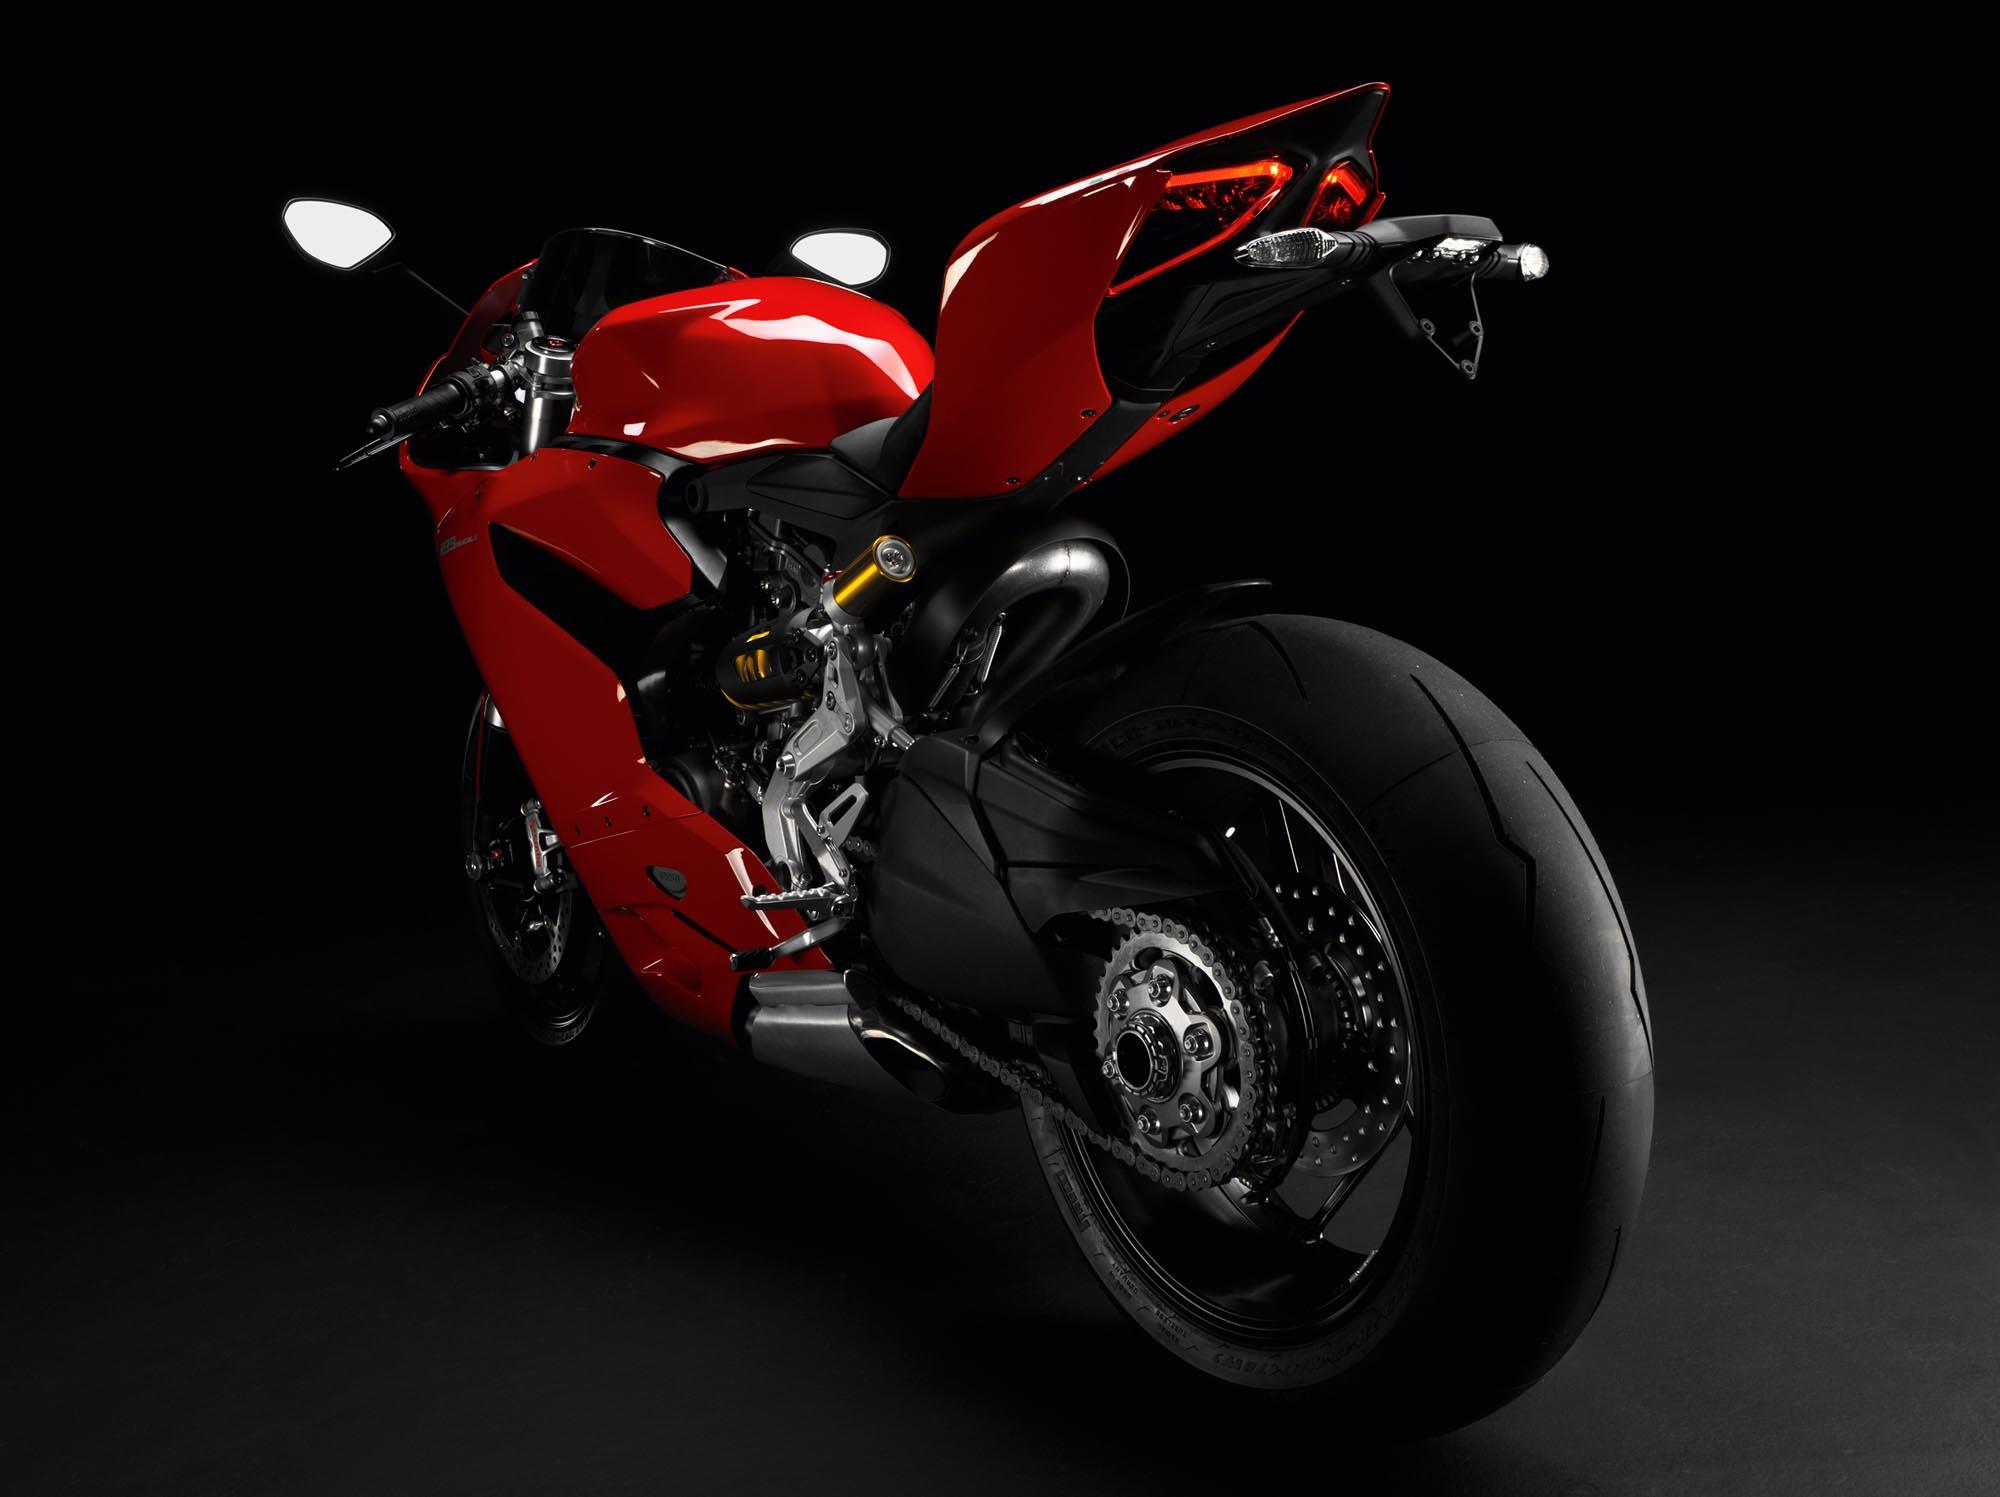 2012 ducati 1199 panigale redefines the word 'superbike' - asphalt